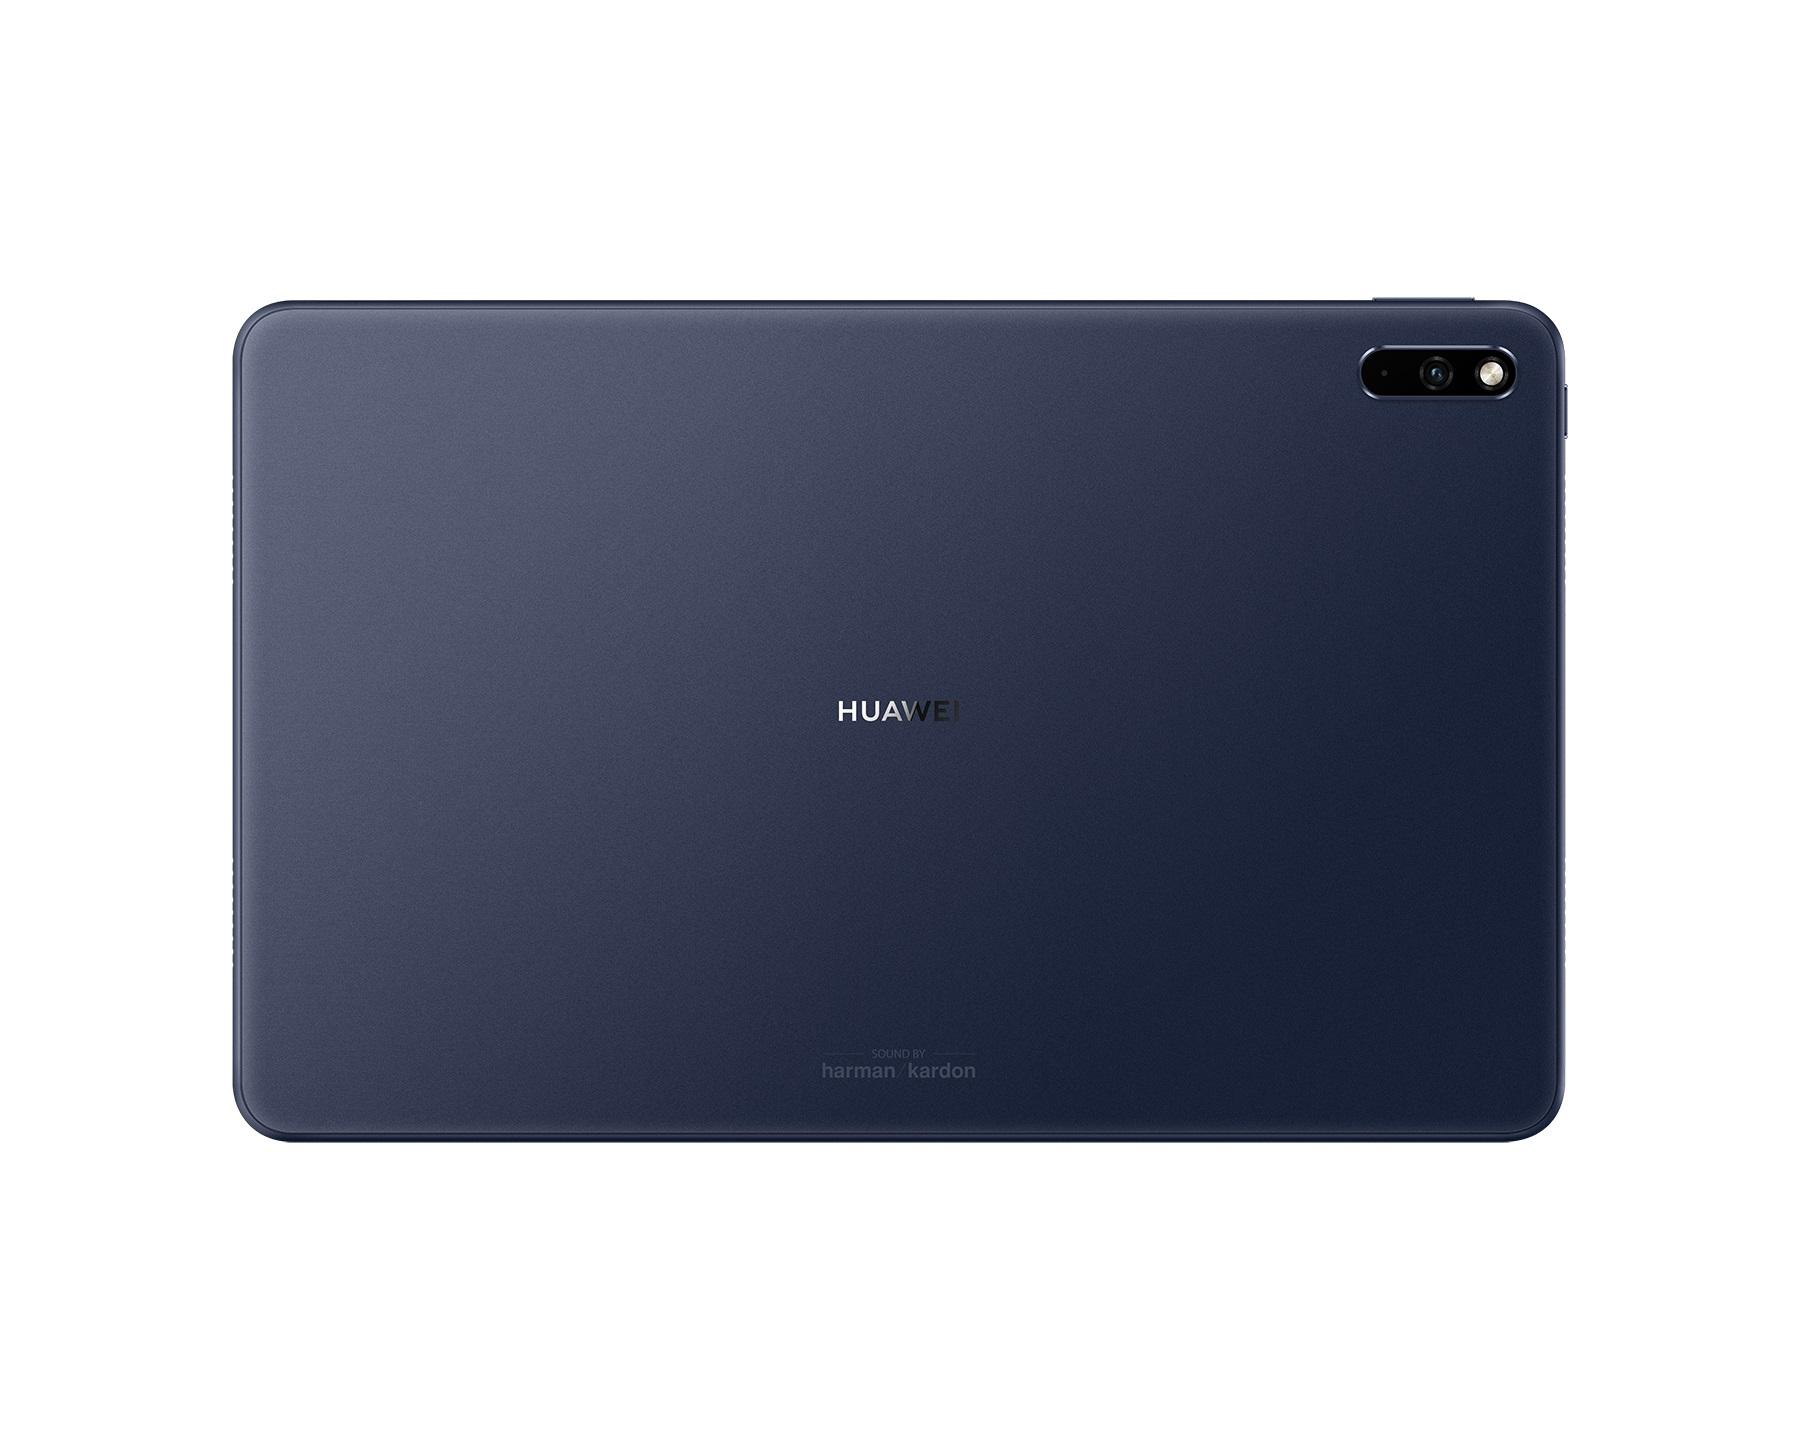 HUAWEI MatePad 10 4+64GB LTE